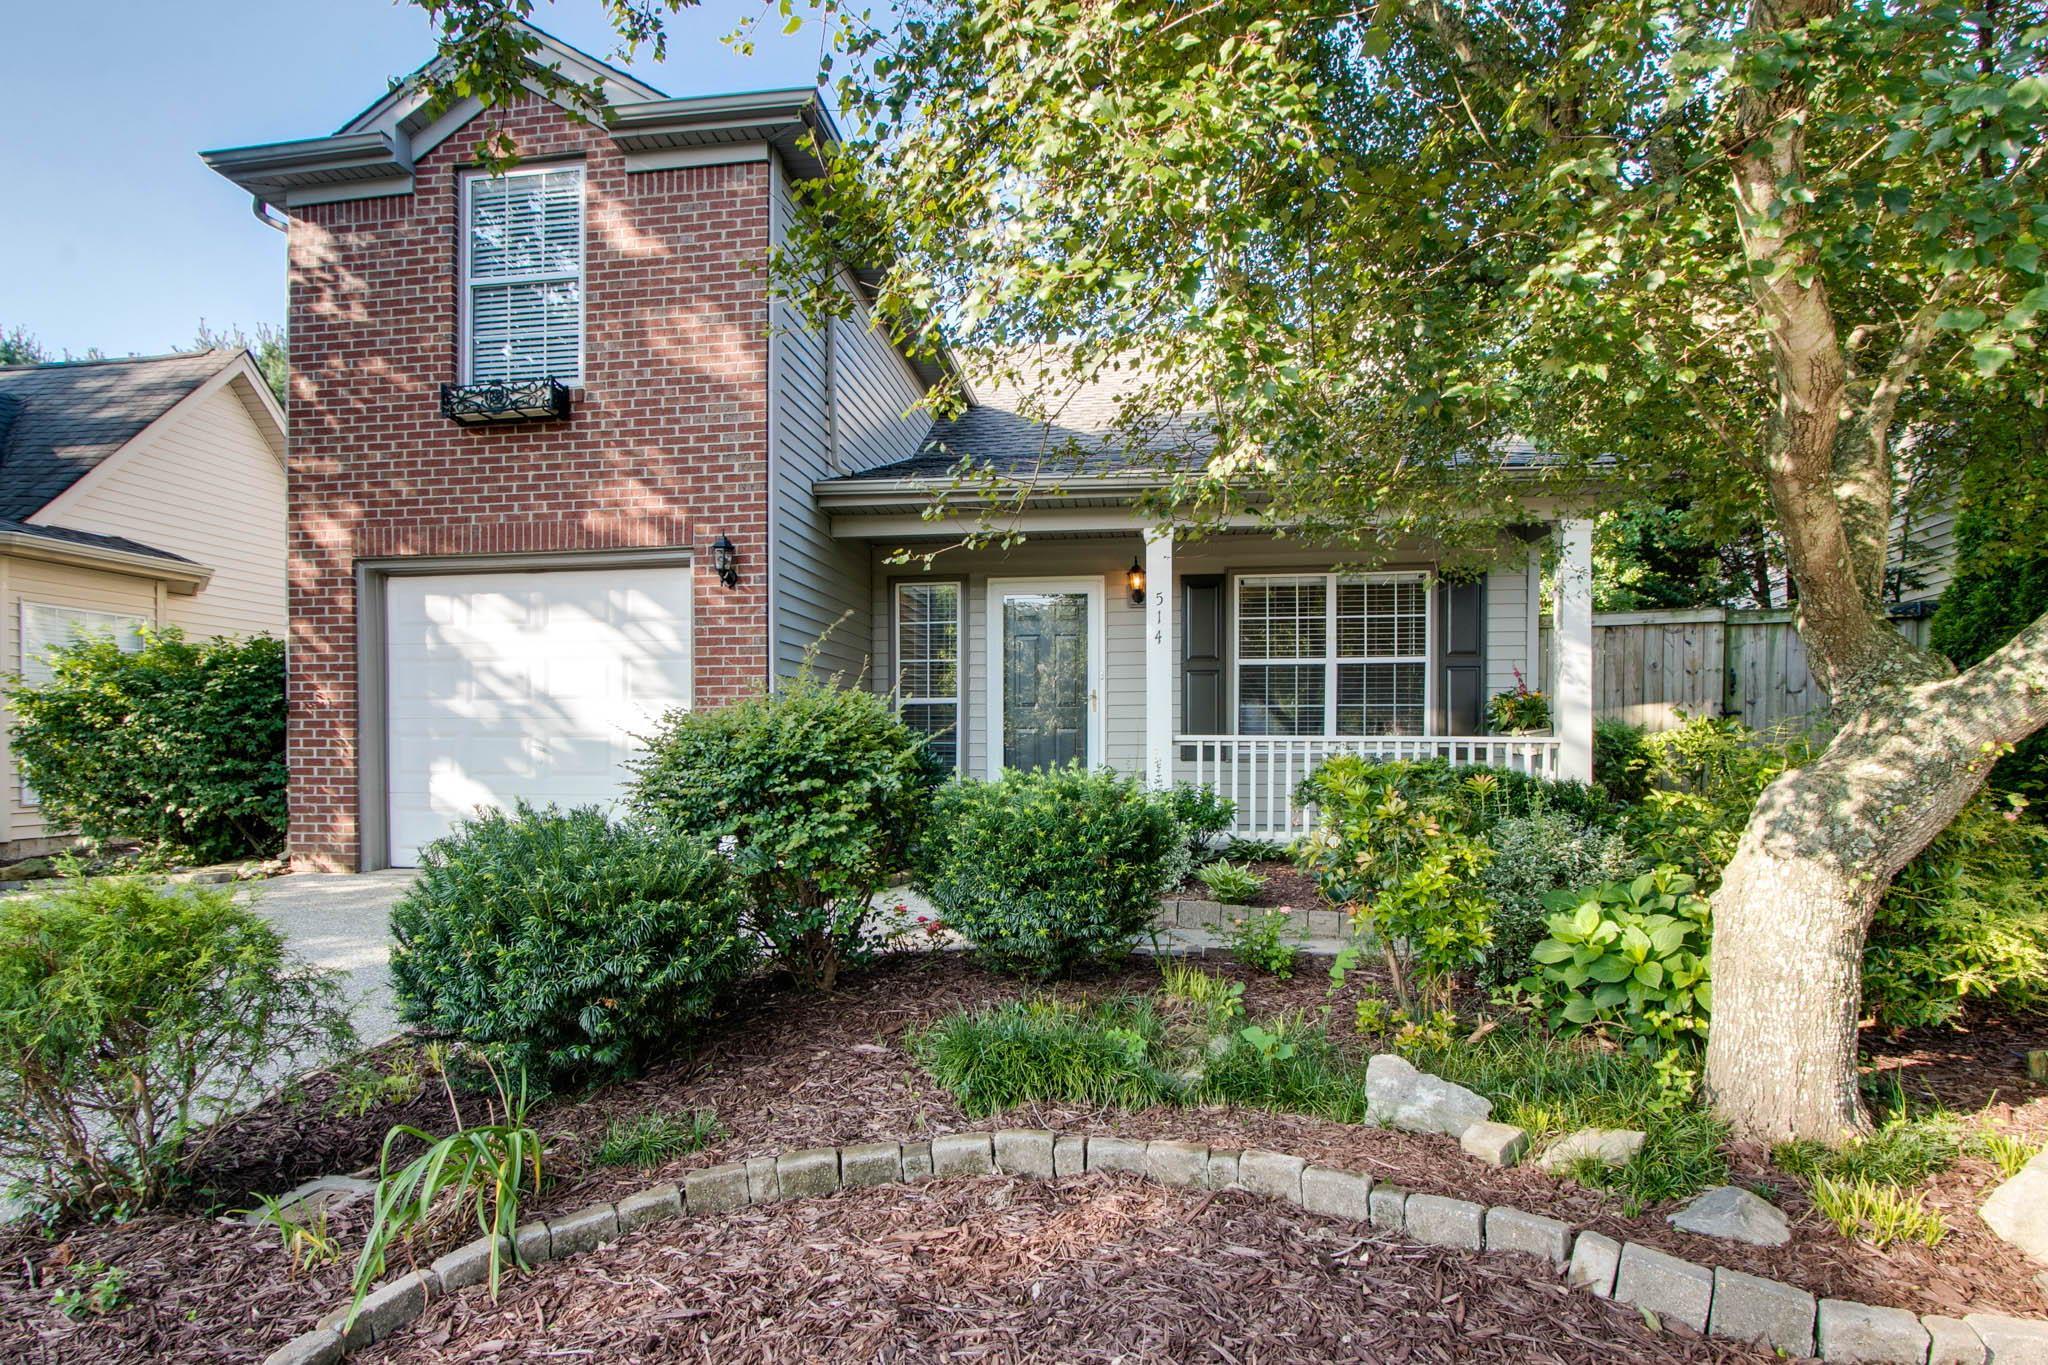 514 Kendall Ct, Franklin, TN 37069 - Franklin, TN real estate listing